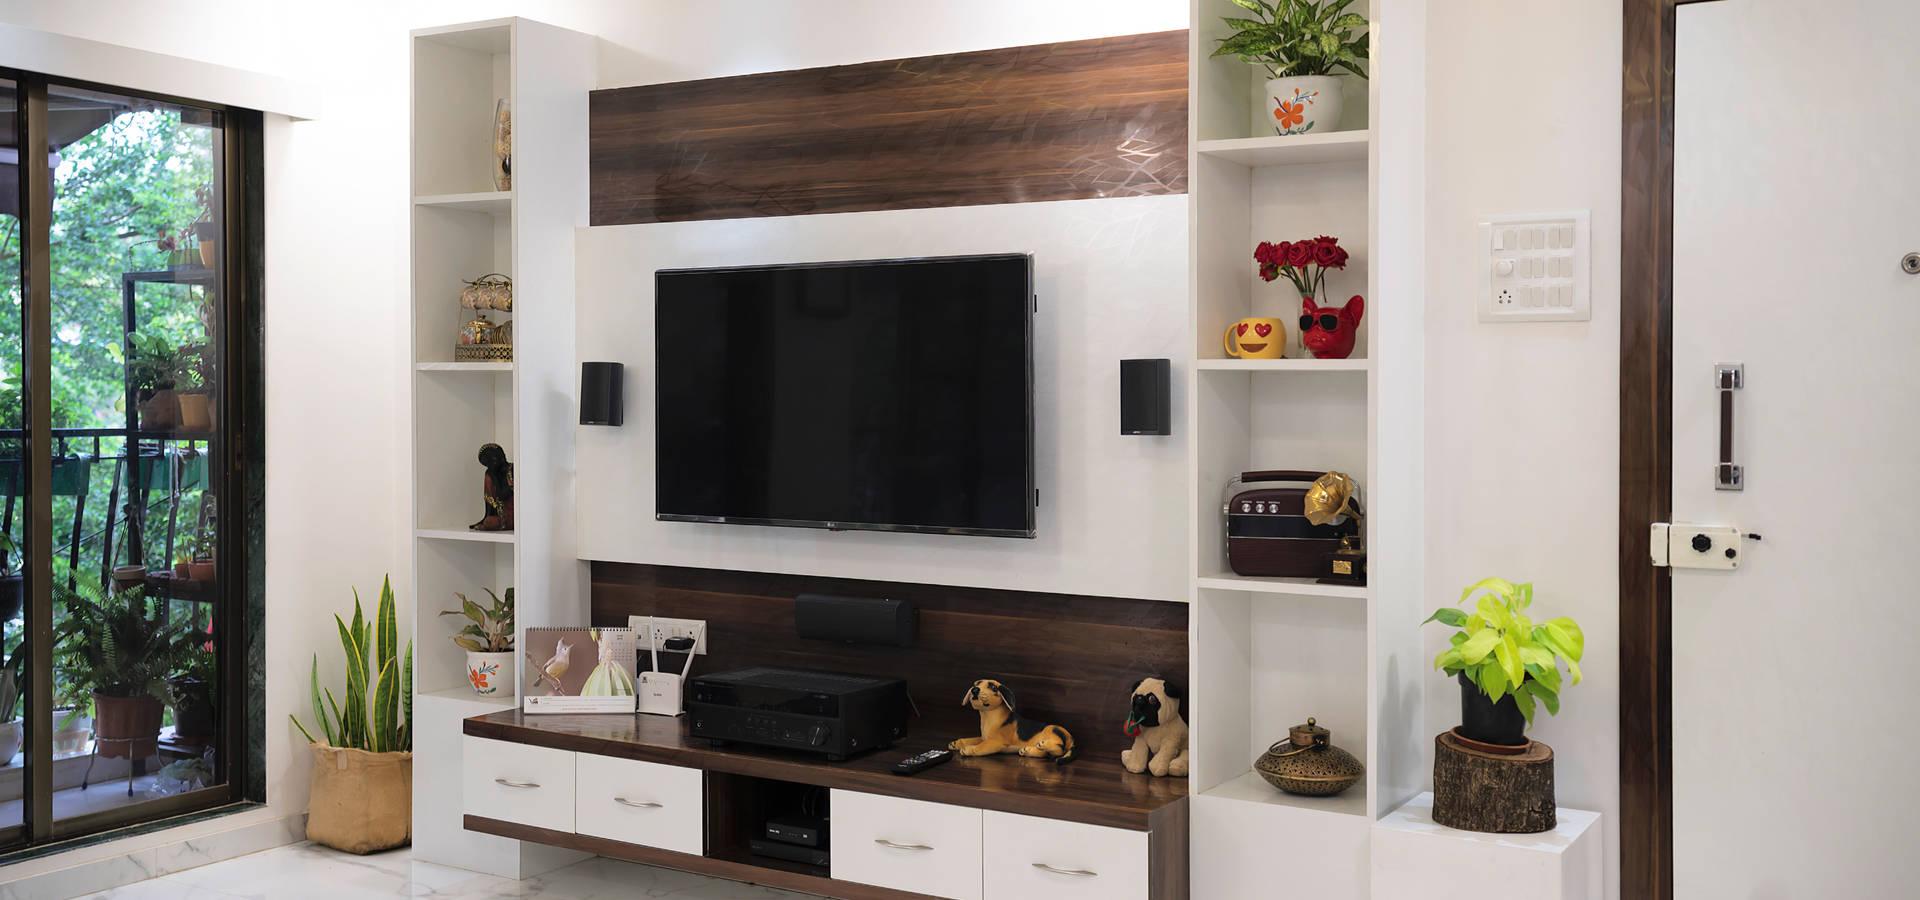 Surekh Home Interior and Decoration